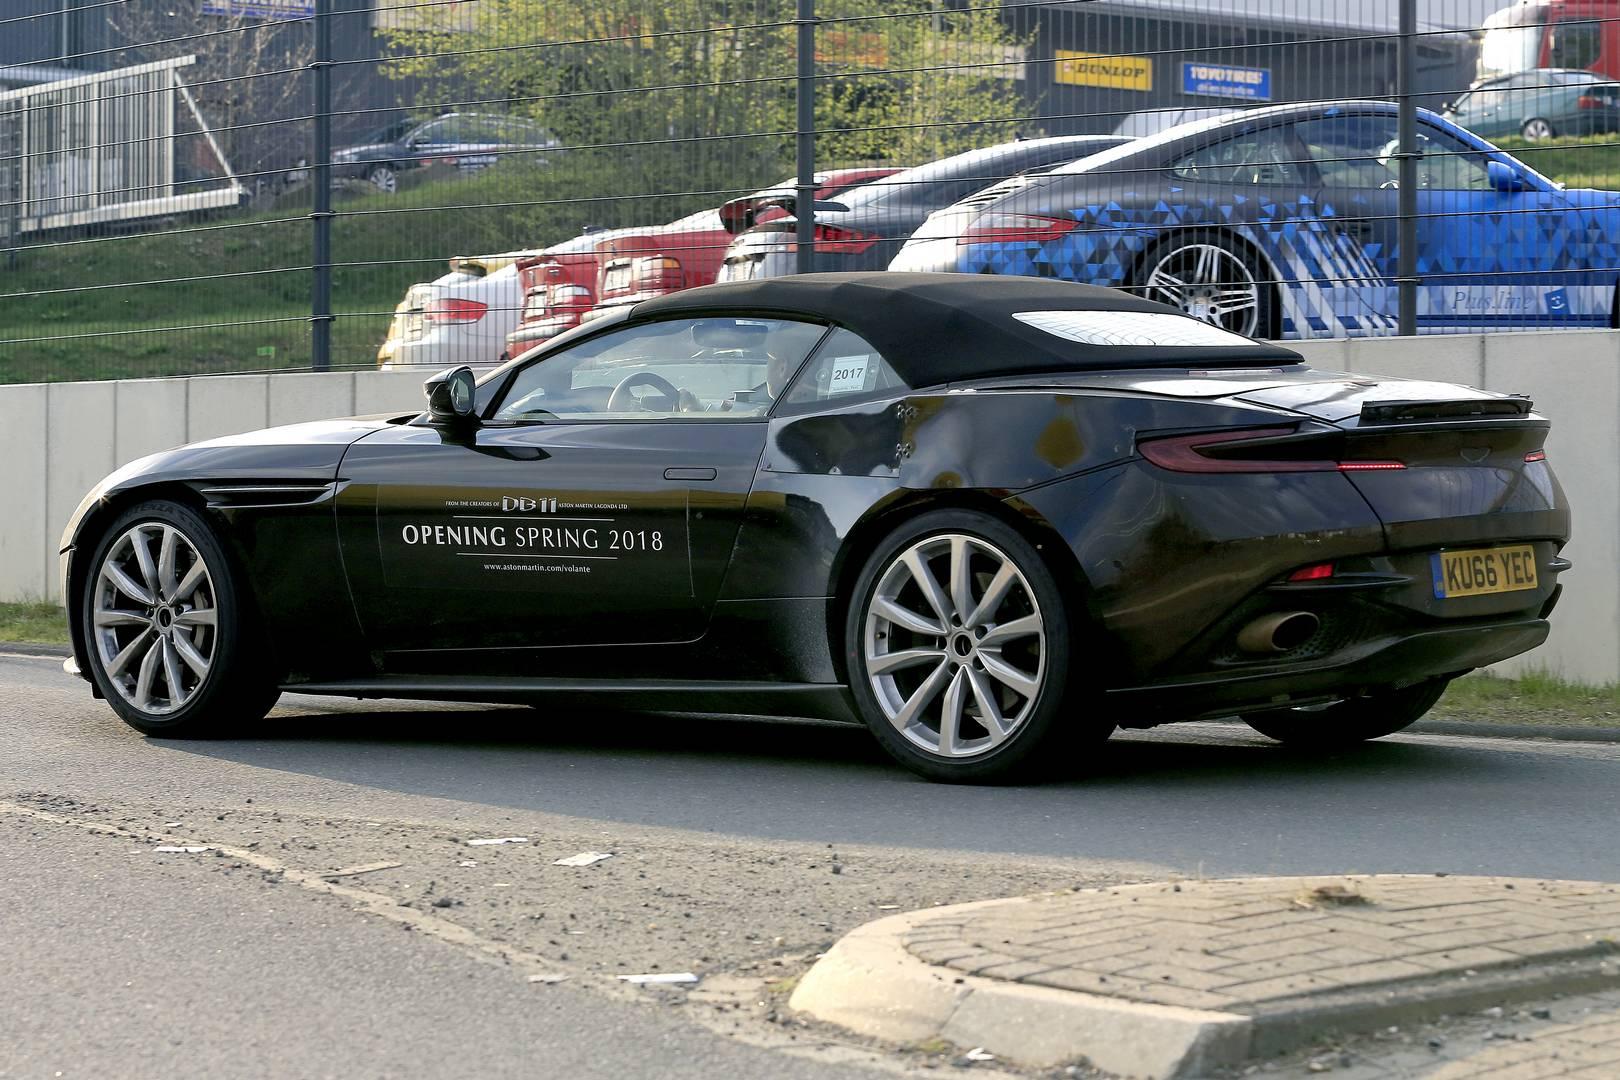 2019 Aston Martin Db11 Volante Spy Shots Gtspirit